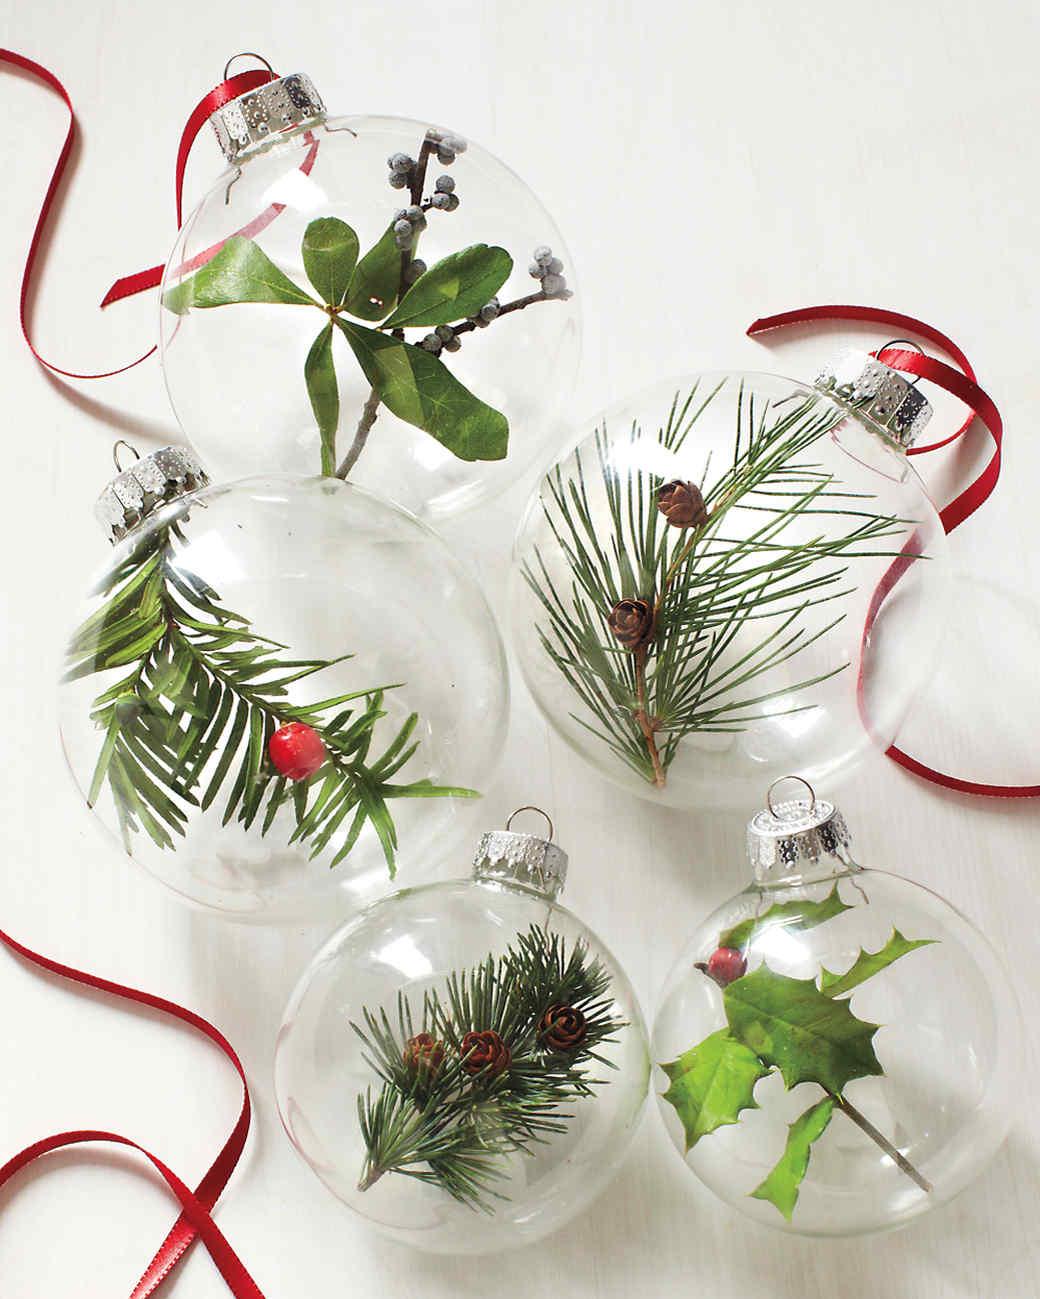 How to Make a Nativity Ornament with a Styrofoam Half Ball forecasting